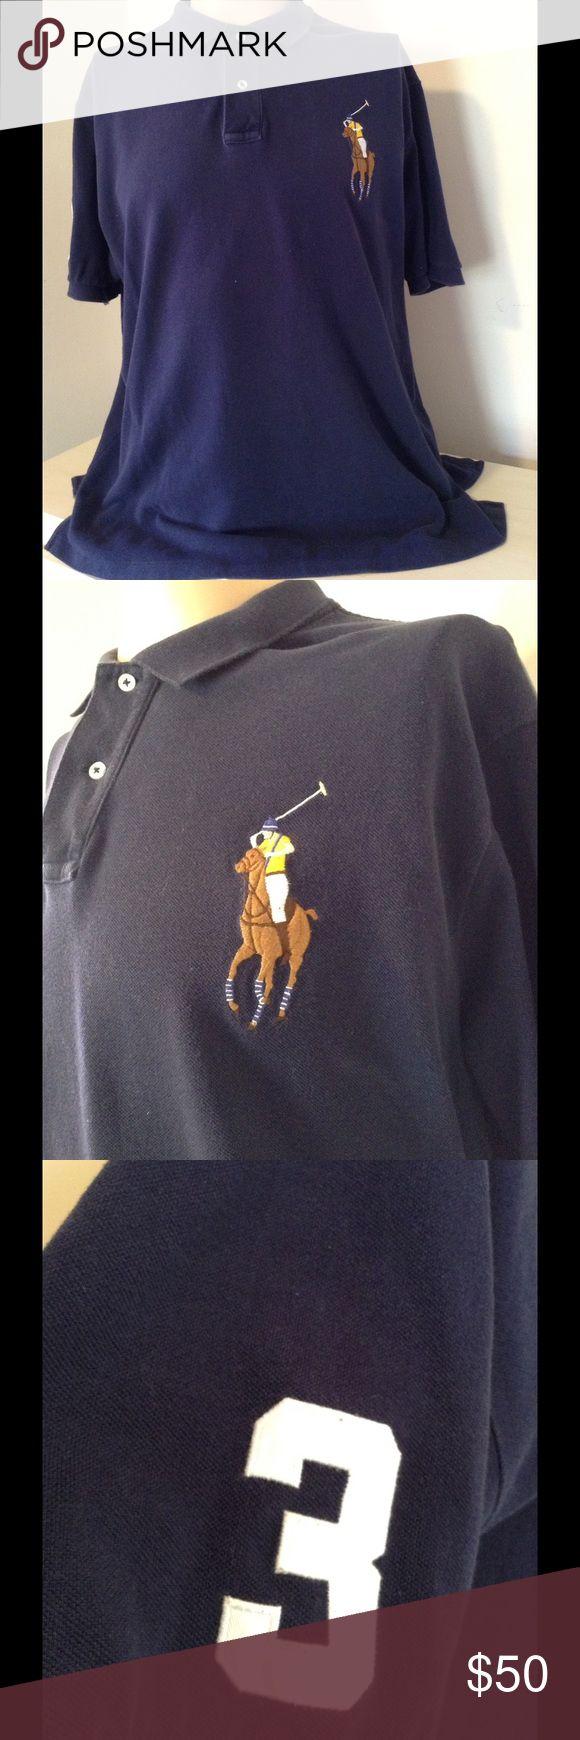 And Shirt – Polo Edge Femme Pas Cher Tee Lauren Engineering Ralph pSULMGqzV